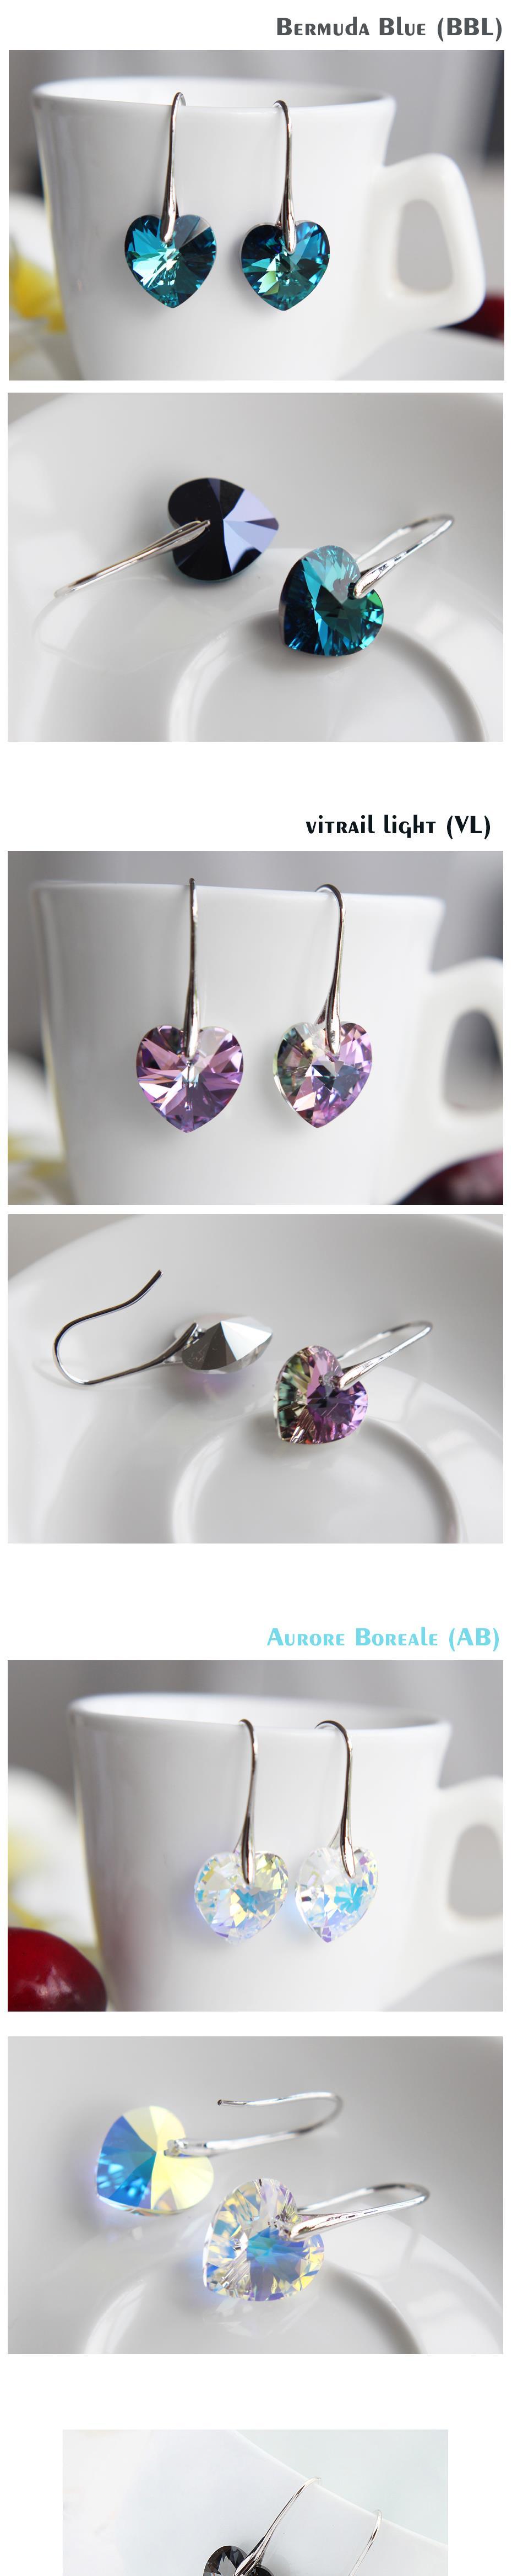 69a9b1f6b Detail Feedback Questions about BeBella crystal heart drop earrings ...